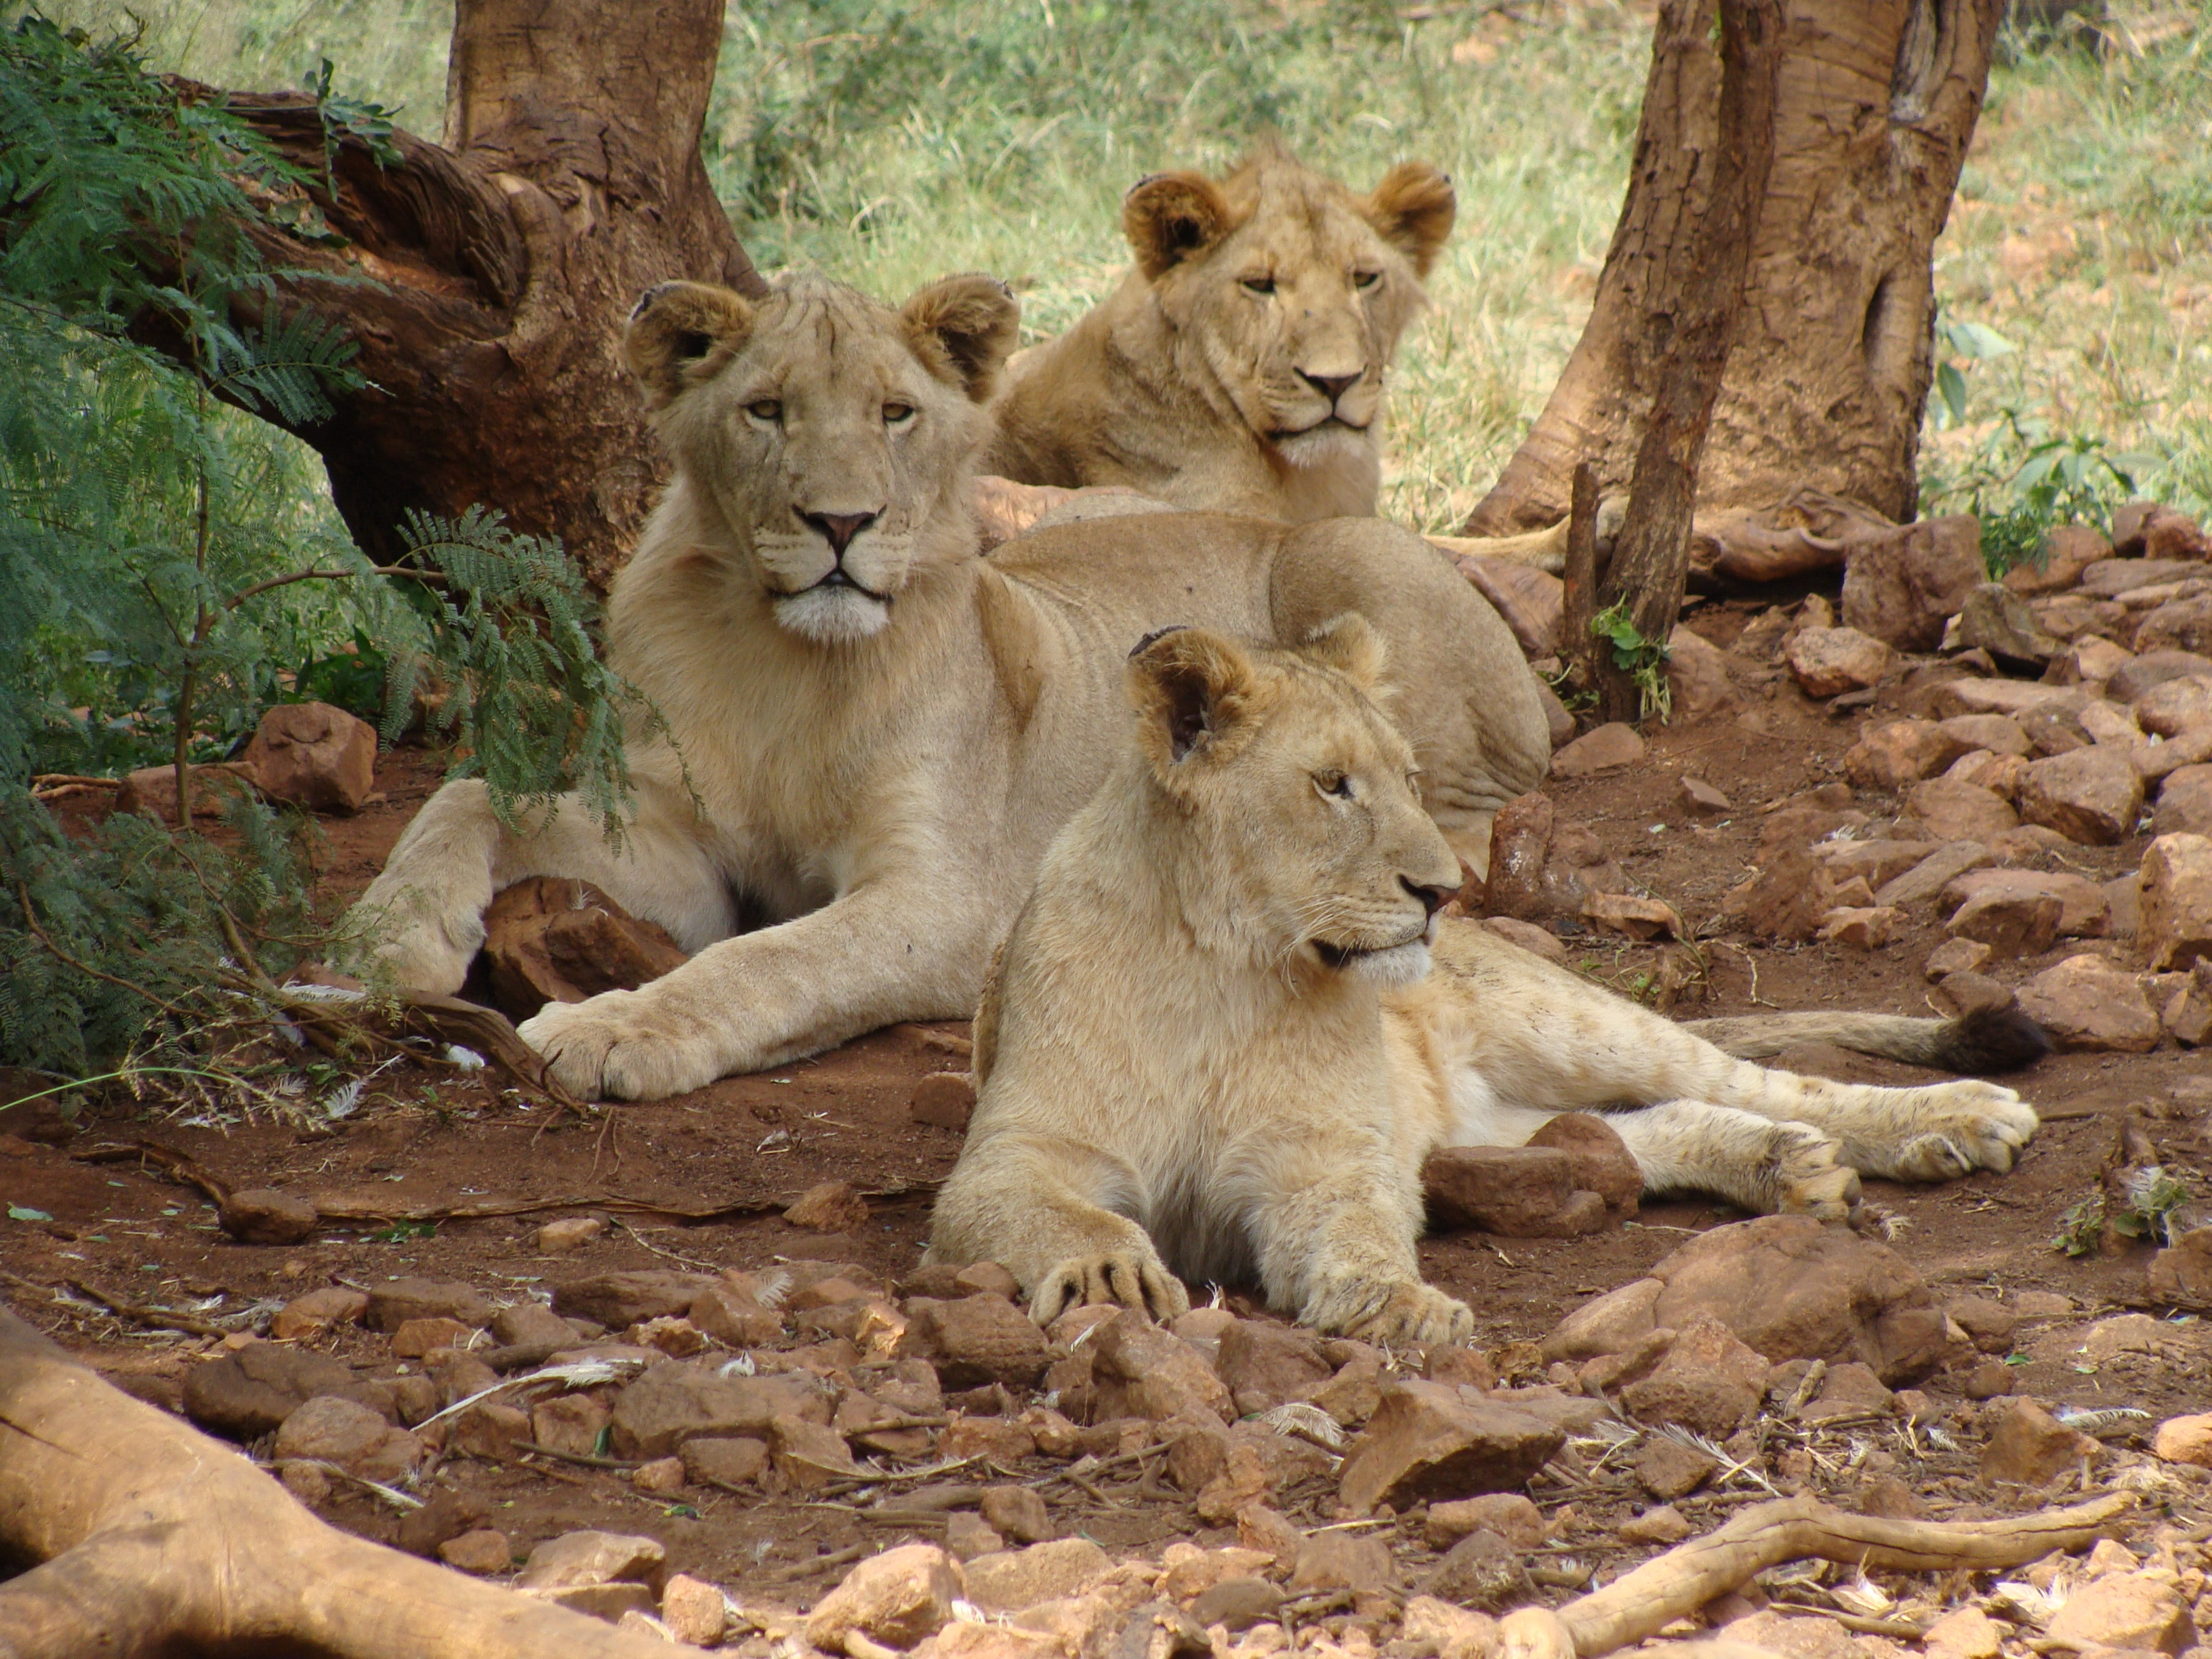 Pride of lions photo